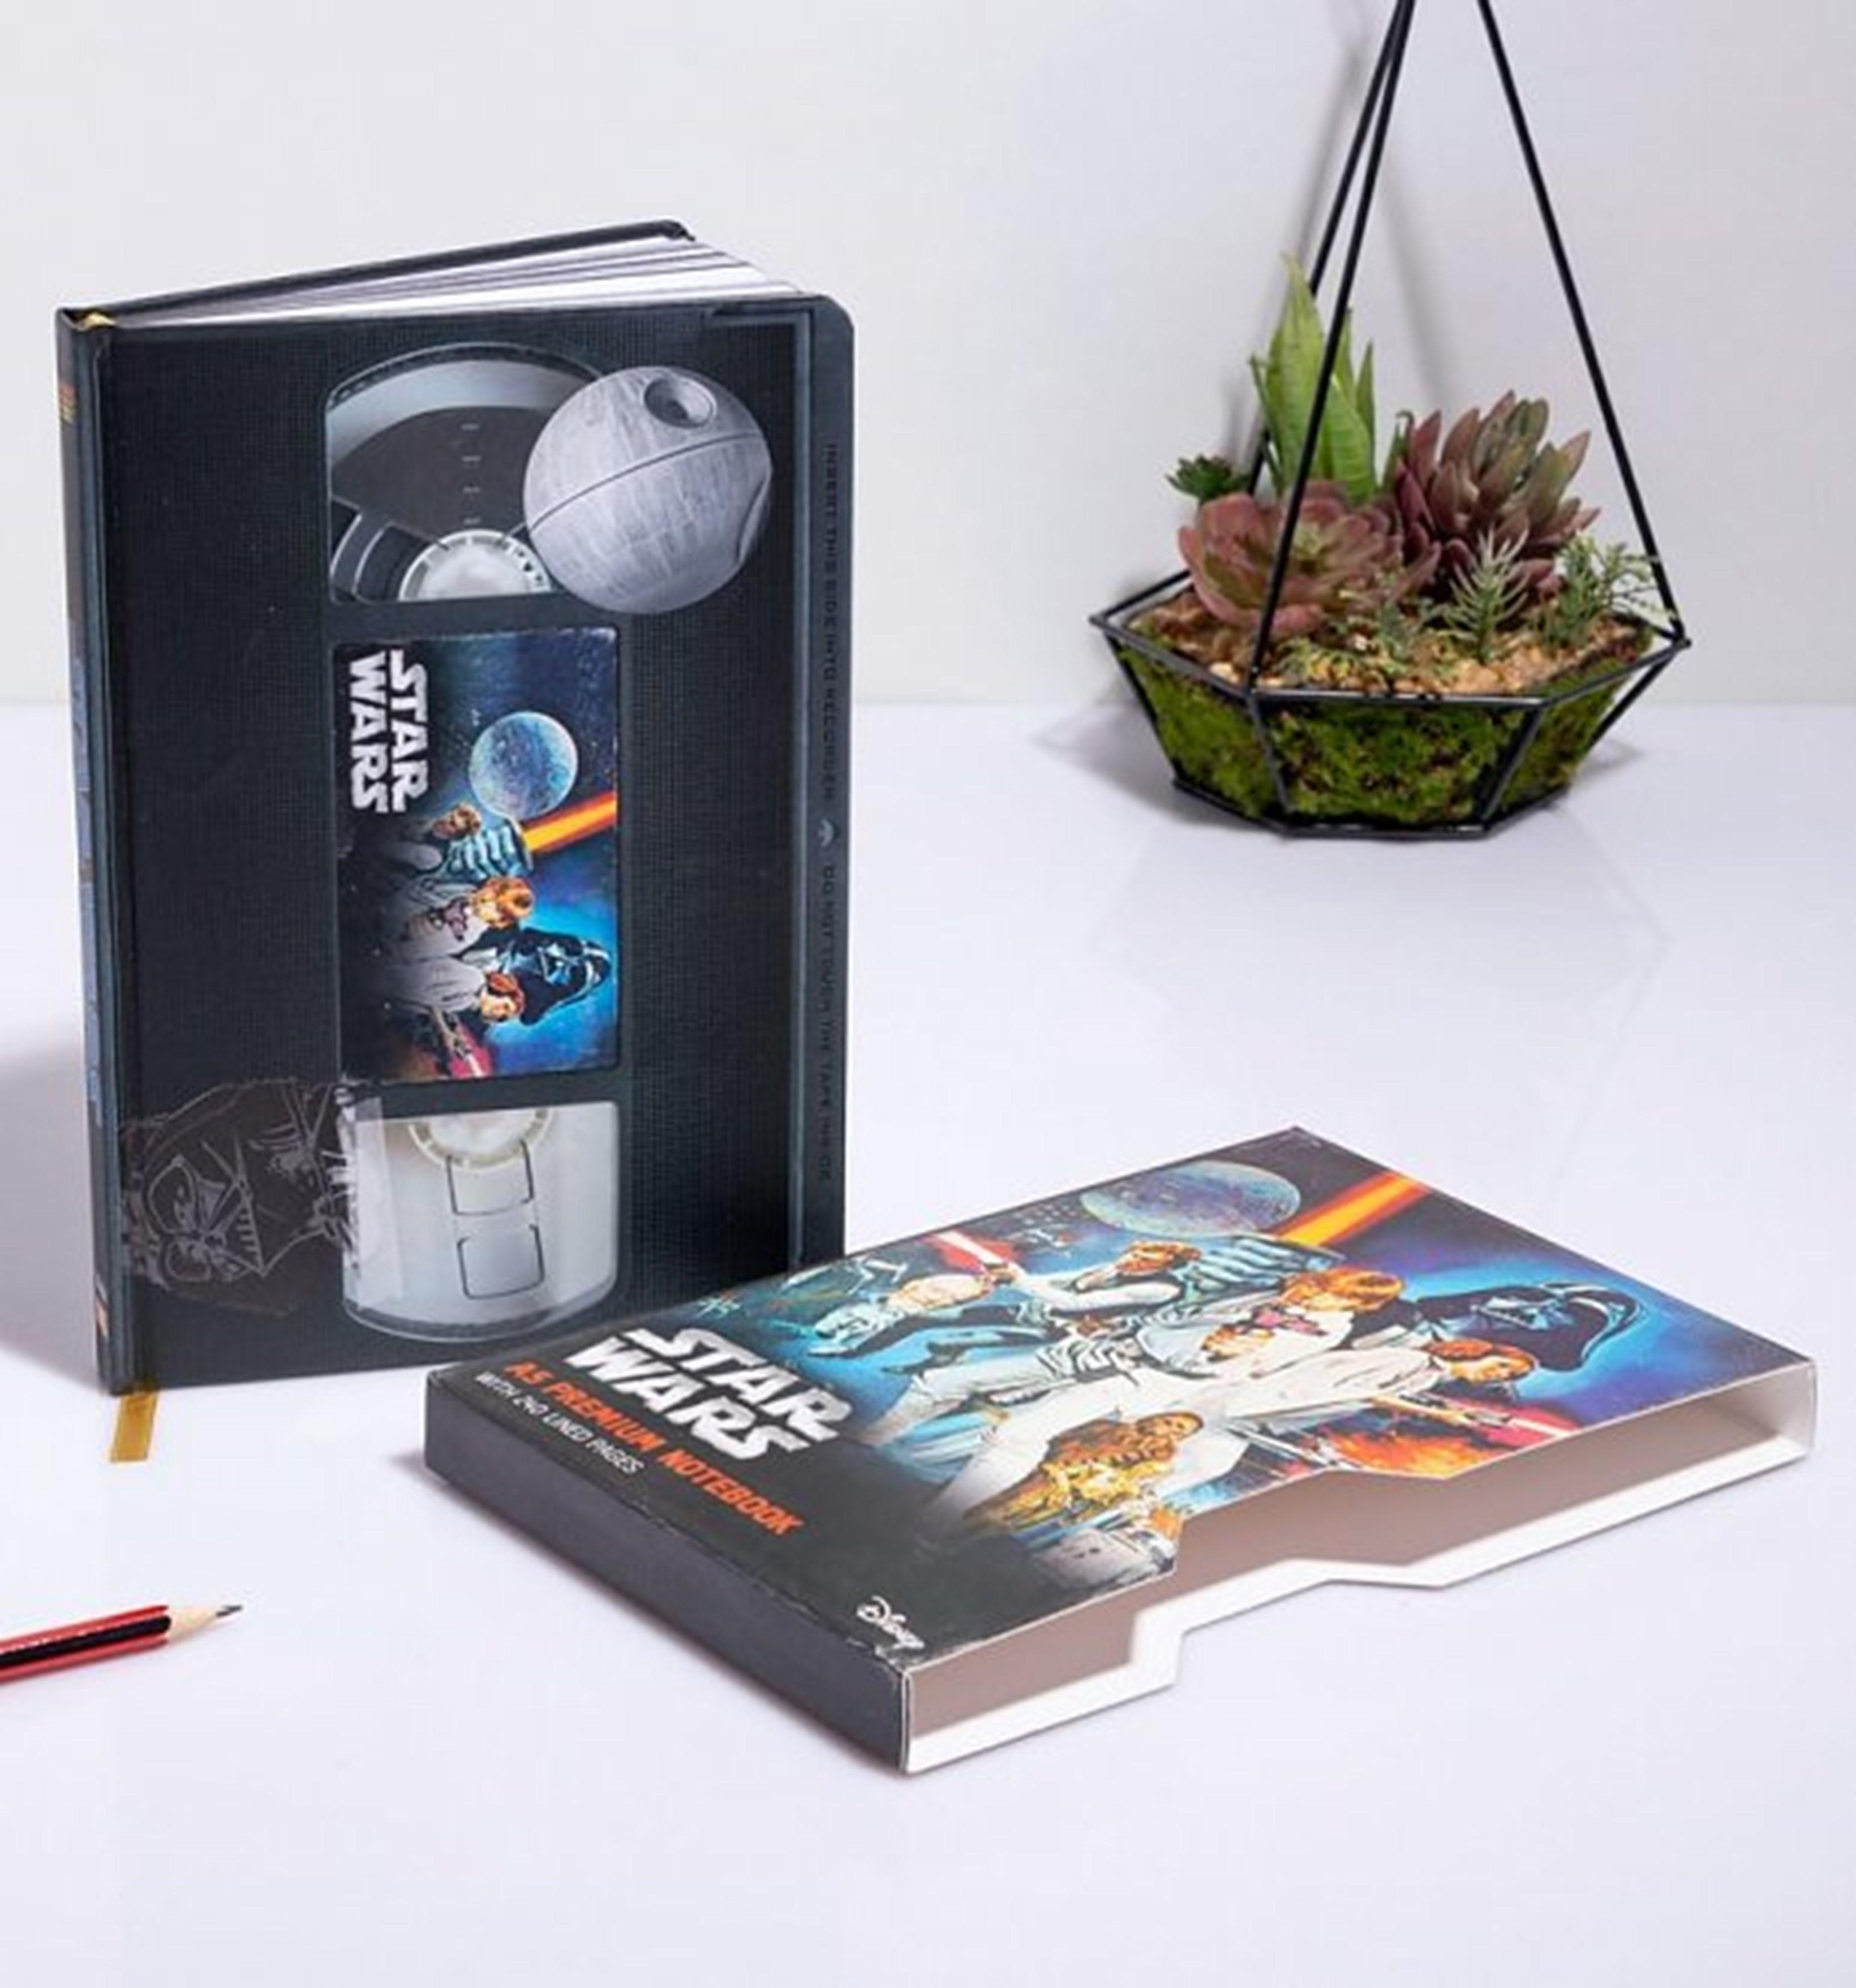 Star Wars (A New Hope) VHS Premium A5 Notebook - 1